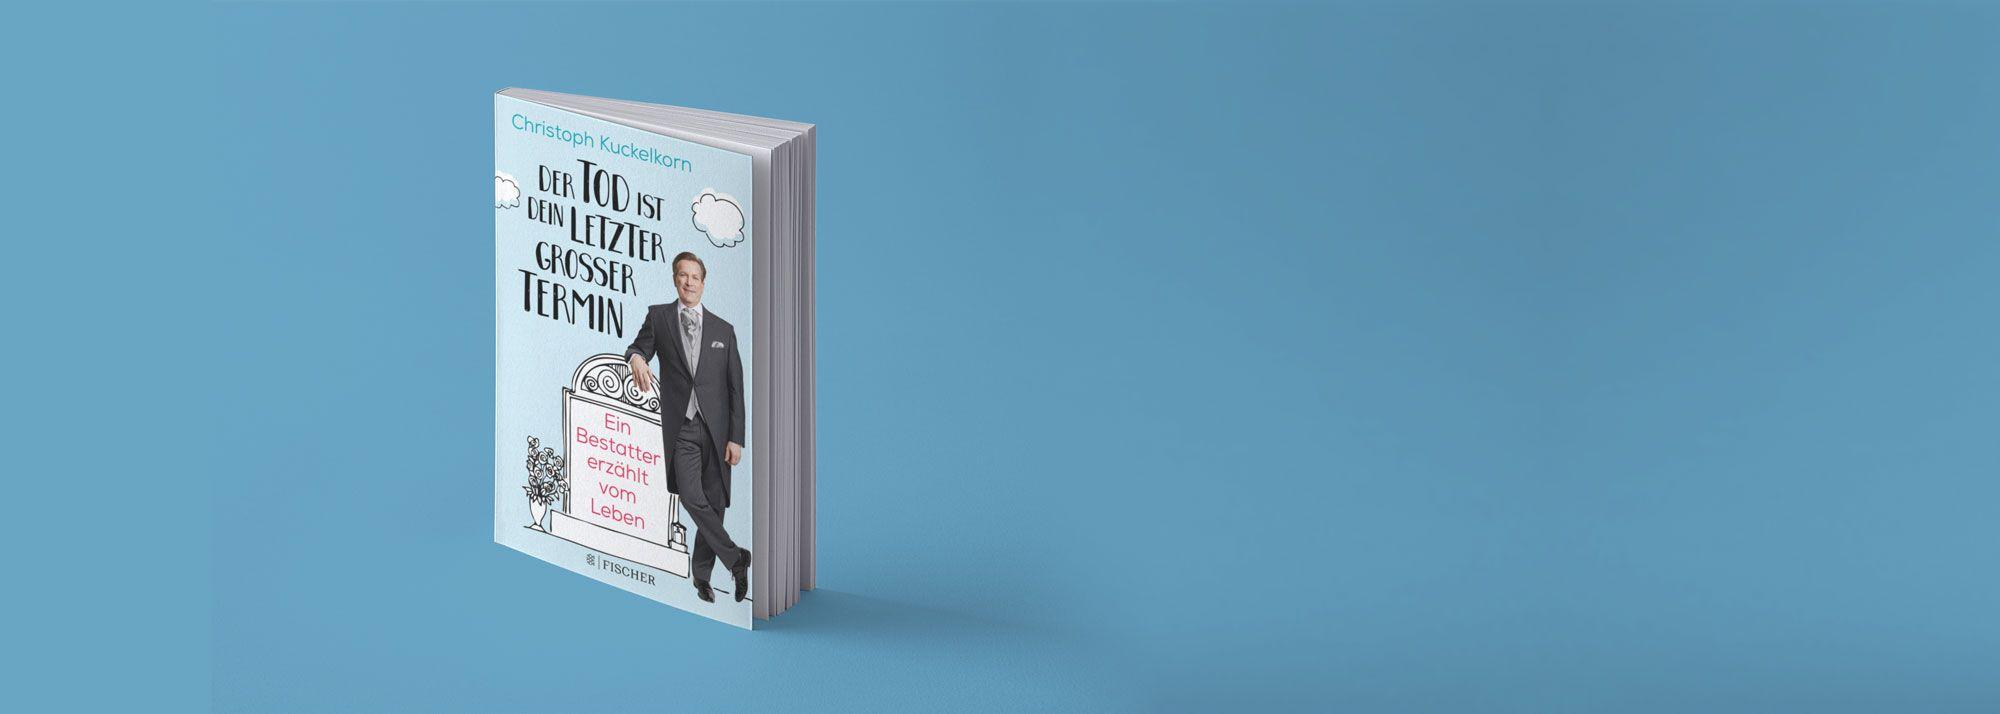 Christoph Kuckelkorn Buch